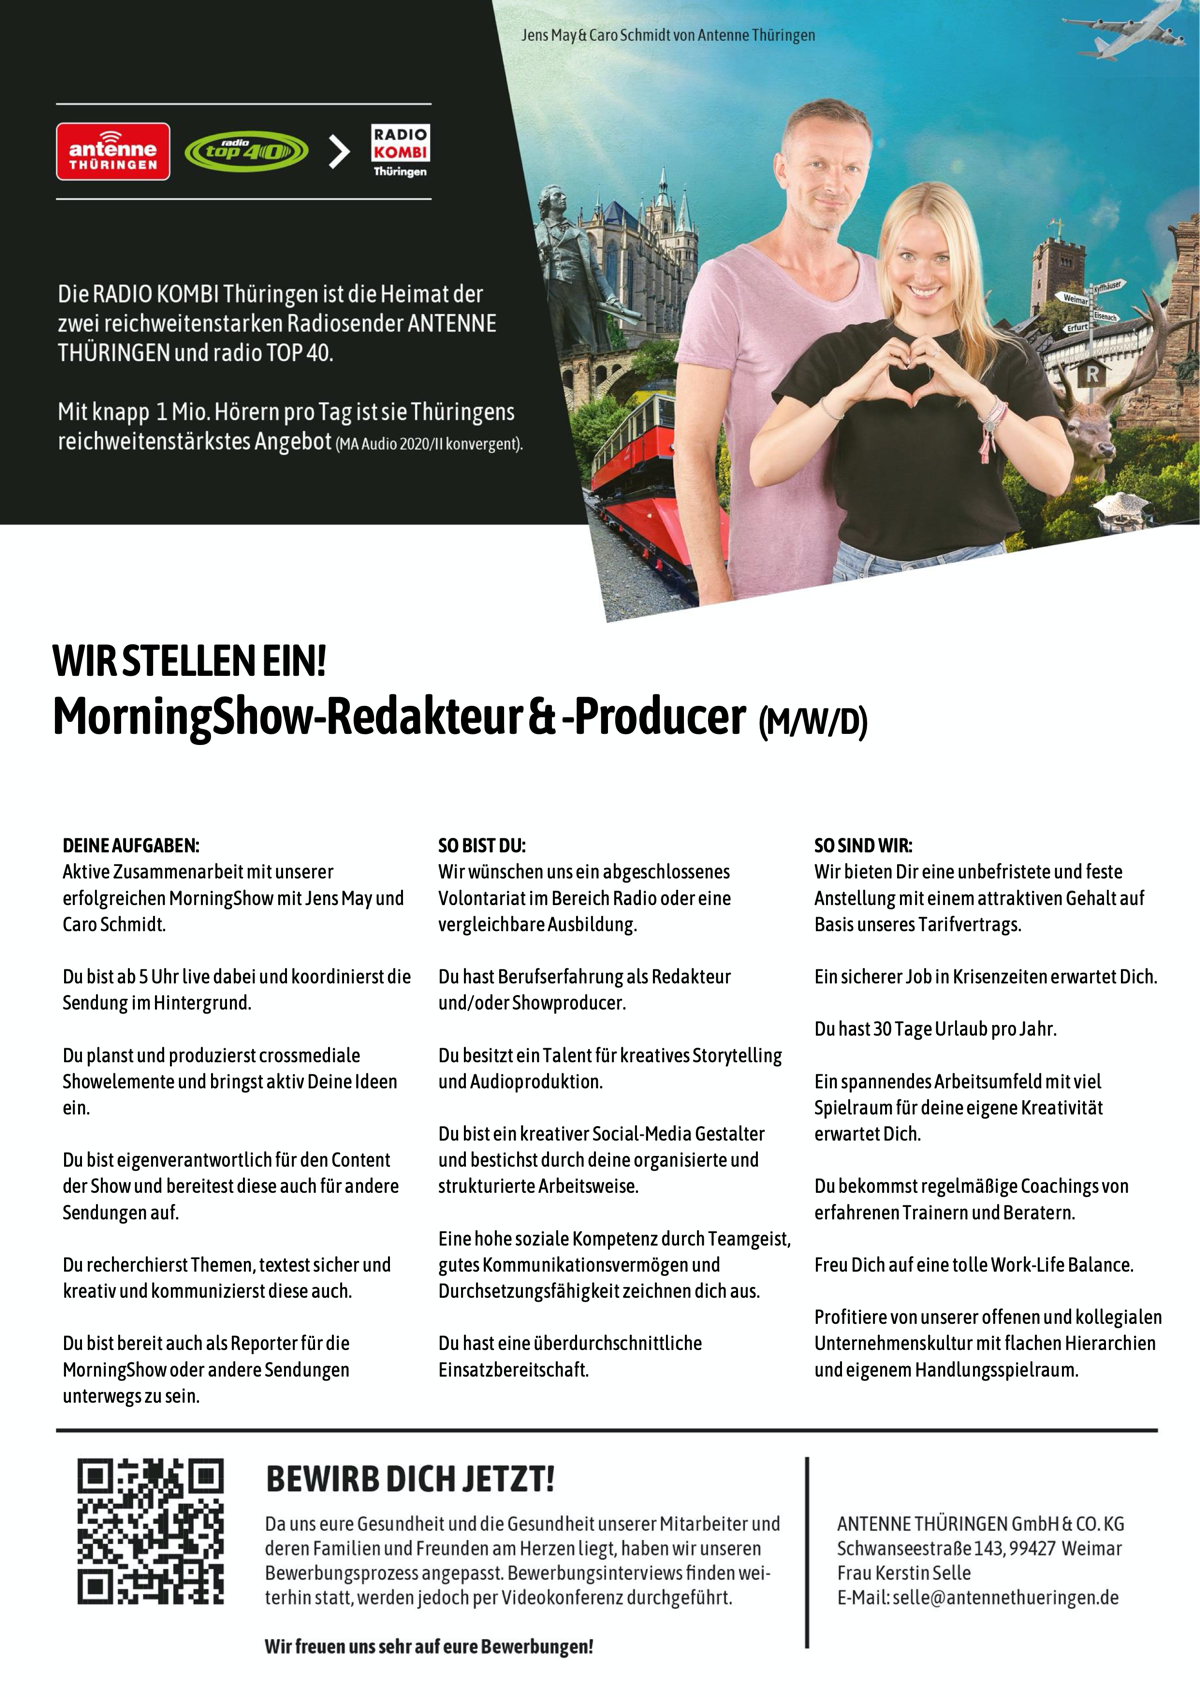 ANTENNE THÜRINGEN sucht MorningShow-Redakteur und -Producer (m/w/d)